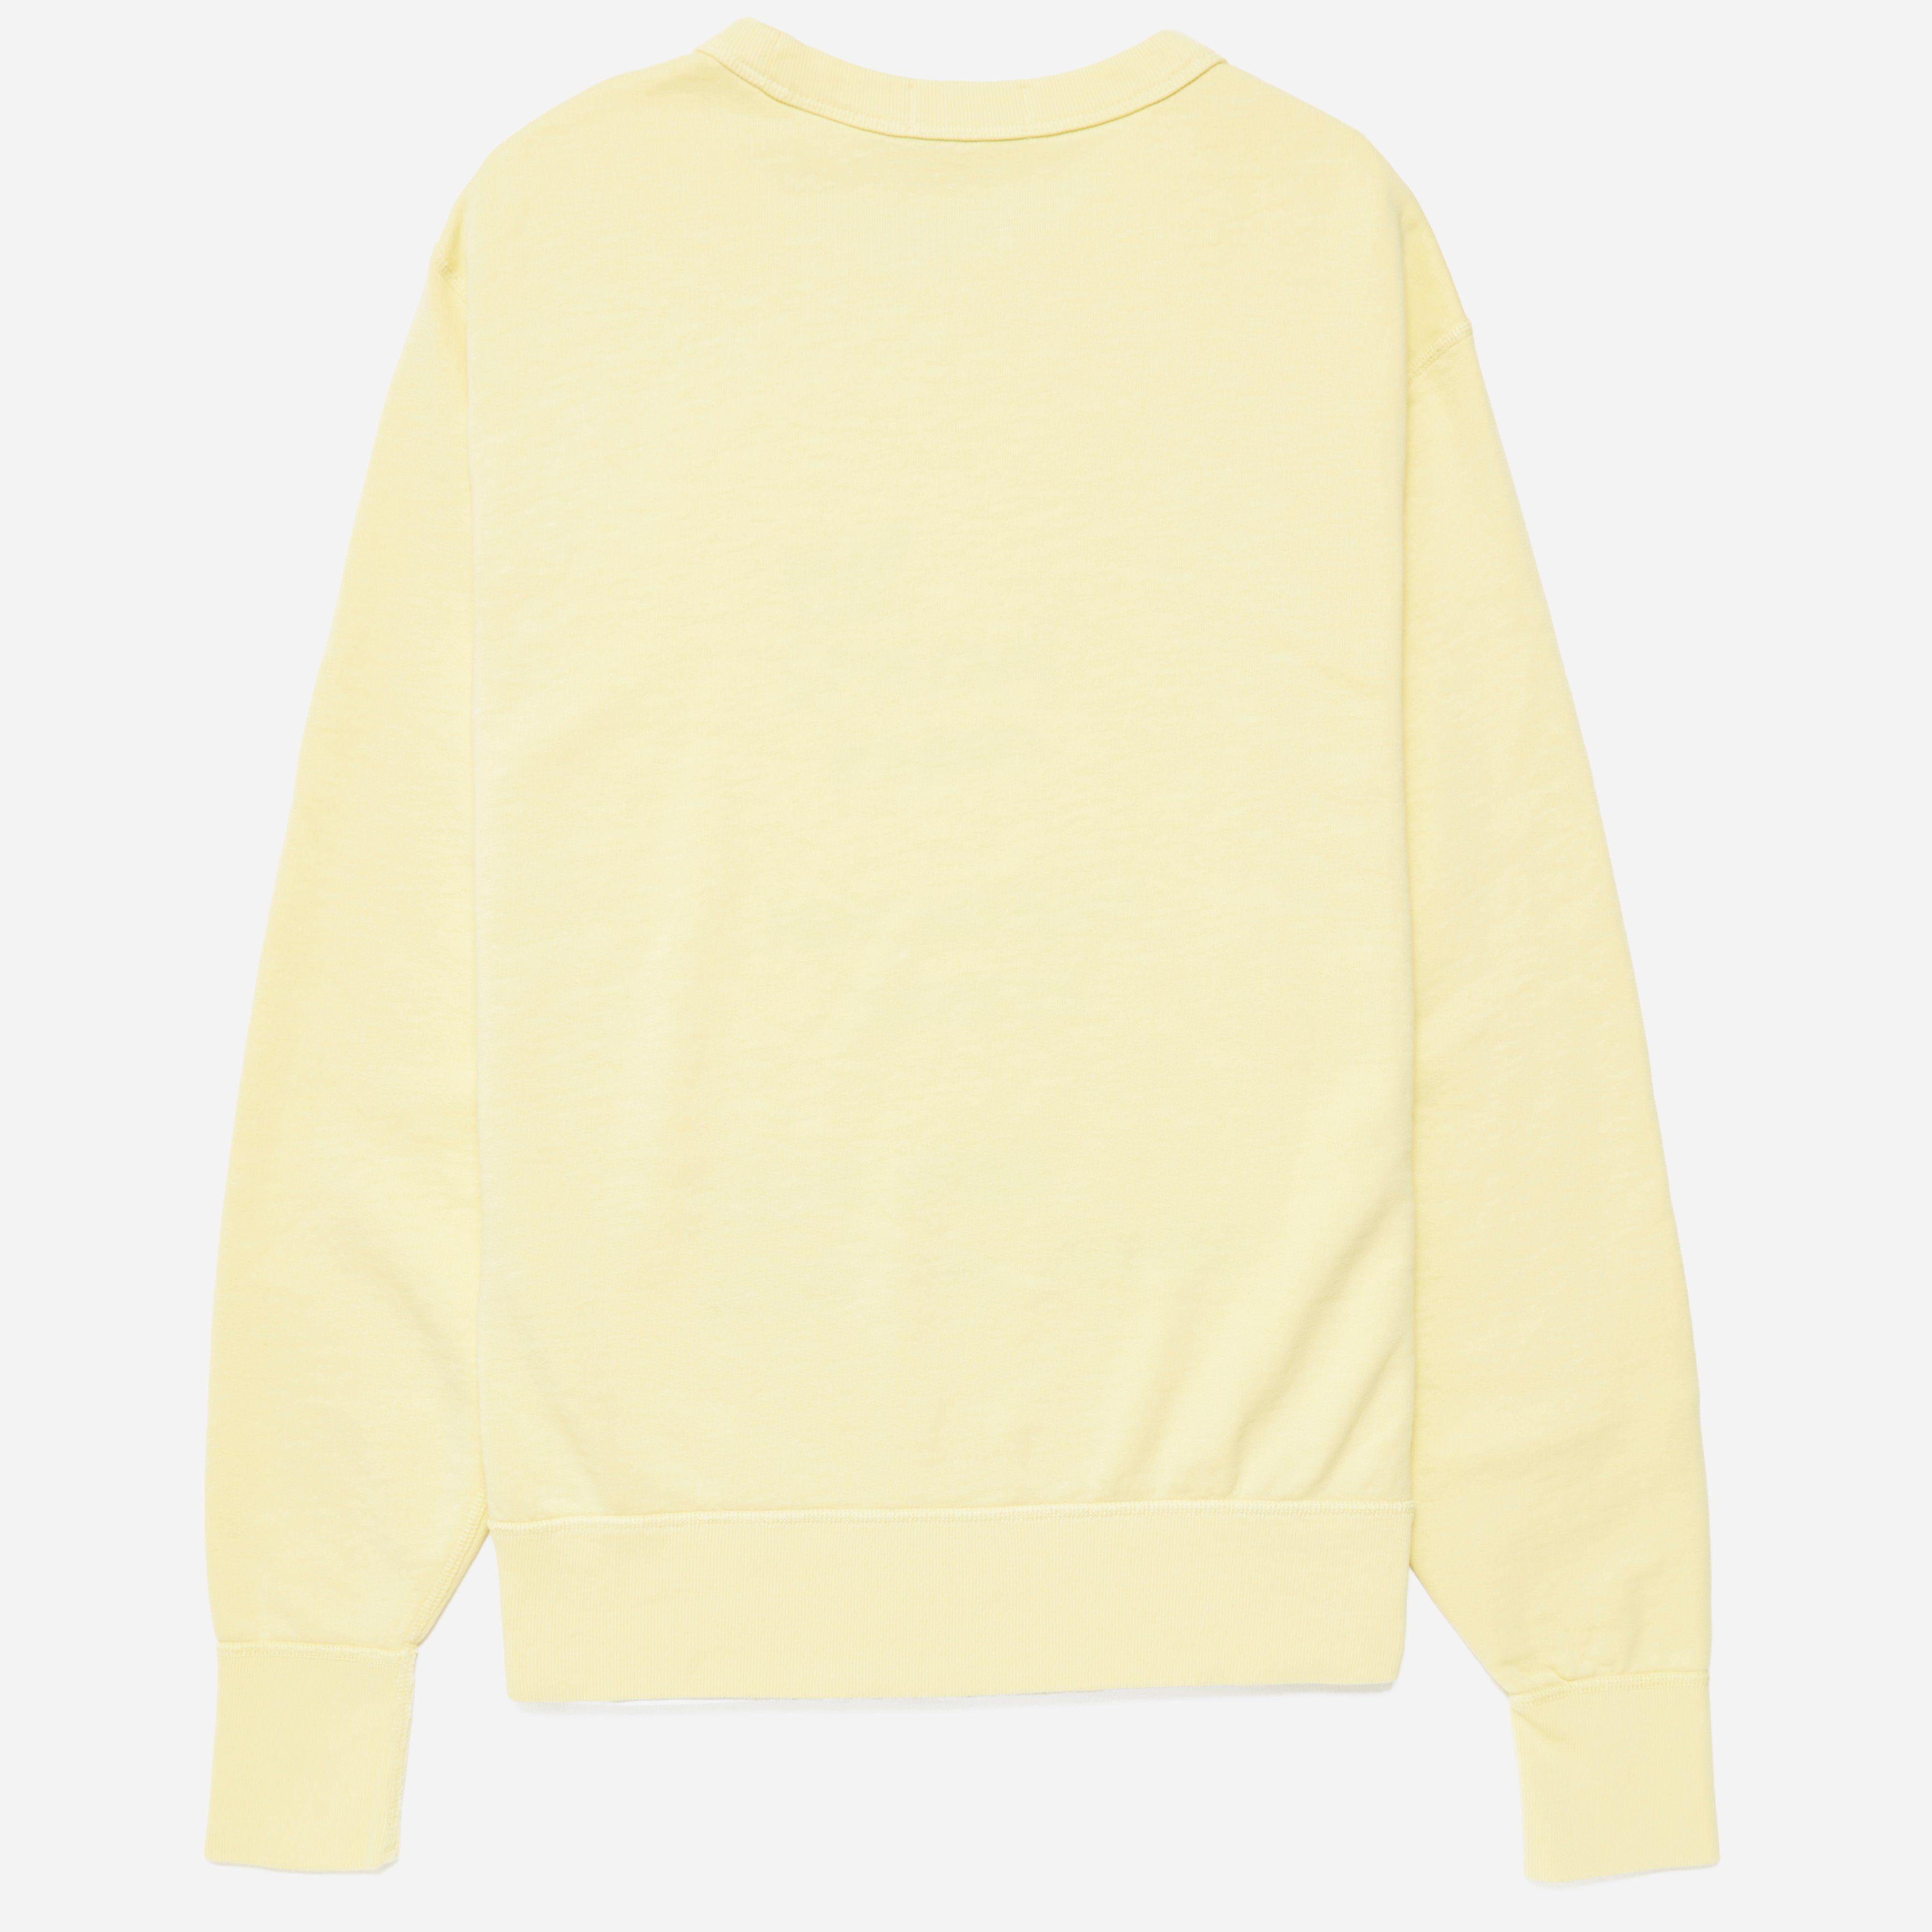 Polo Ralph Lauren Knit Fleece Sweatshirt